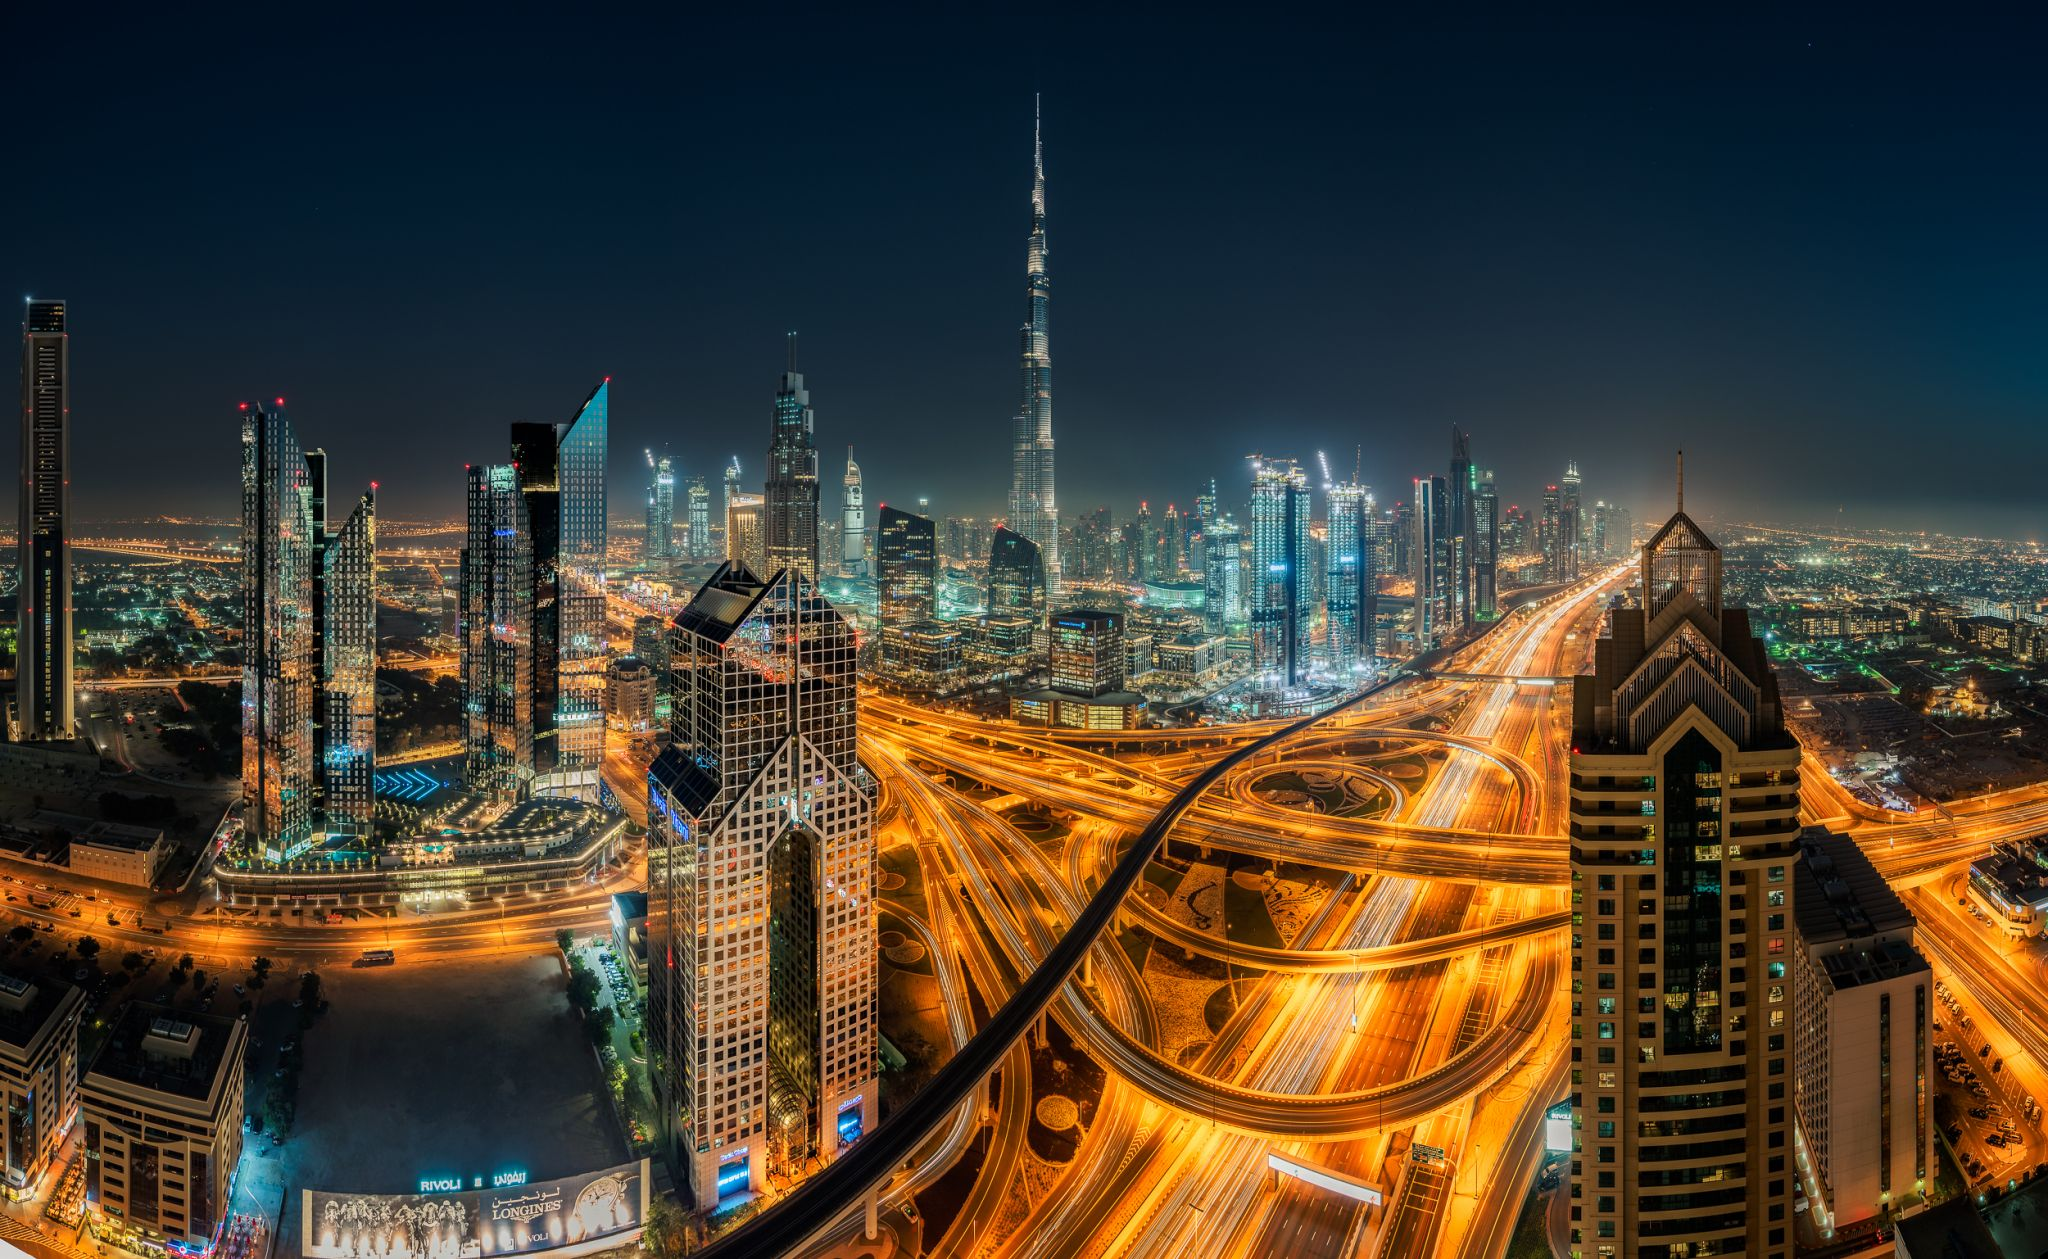 Burj Khalifa view from Shangri-La, United Arab Emirates